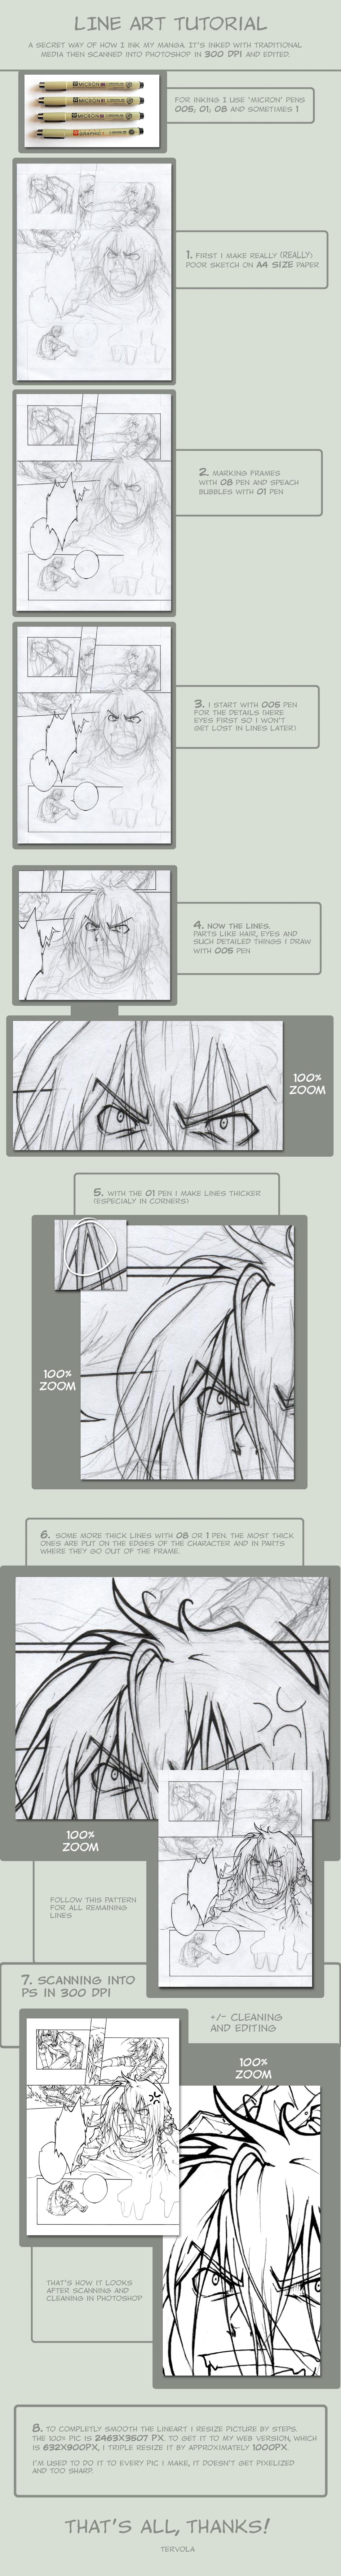 Line Art Photo Tutorial : Line art tutorial comic by tervola on deviantart